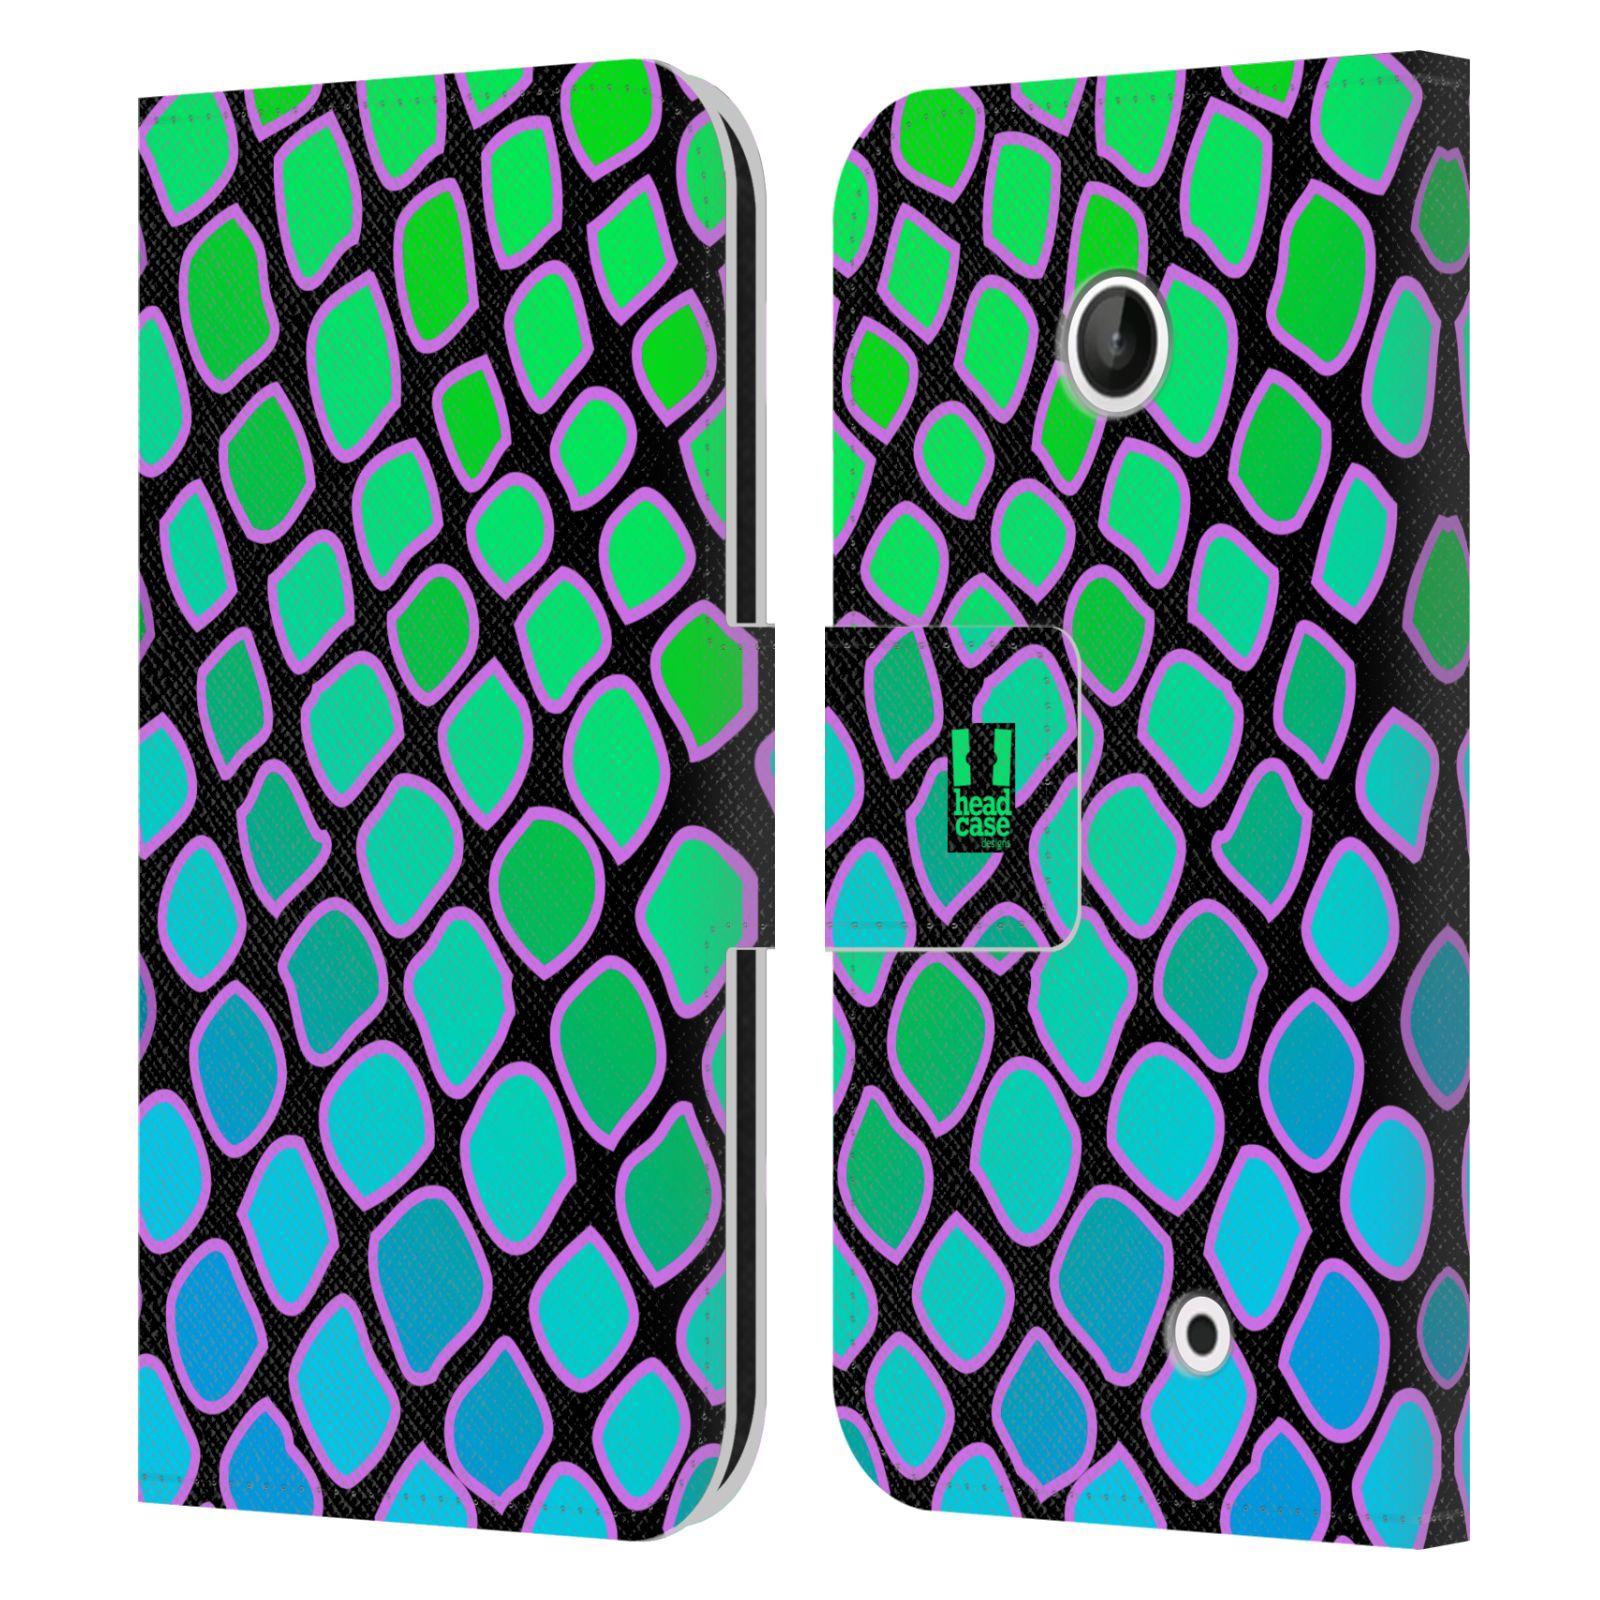 HEAD CASE Flipové pouzdro pro mobil NOKIA LUMIA 630 / LUMIA 630 DUAL Zvířecí barevné vzory vodní had modrá a zelená barva AQUA